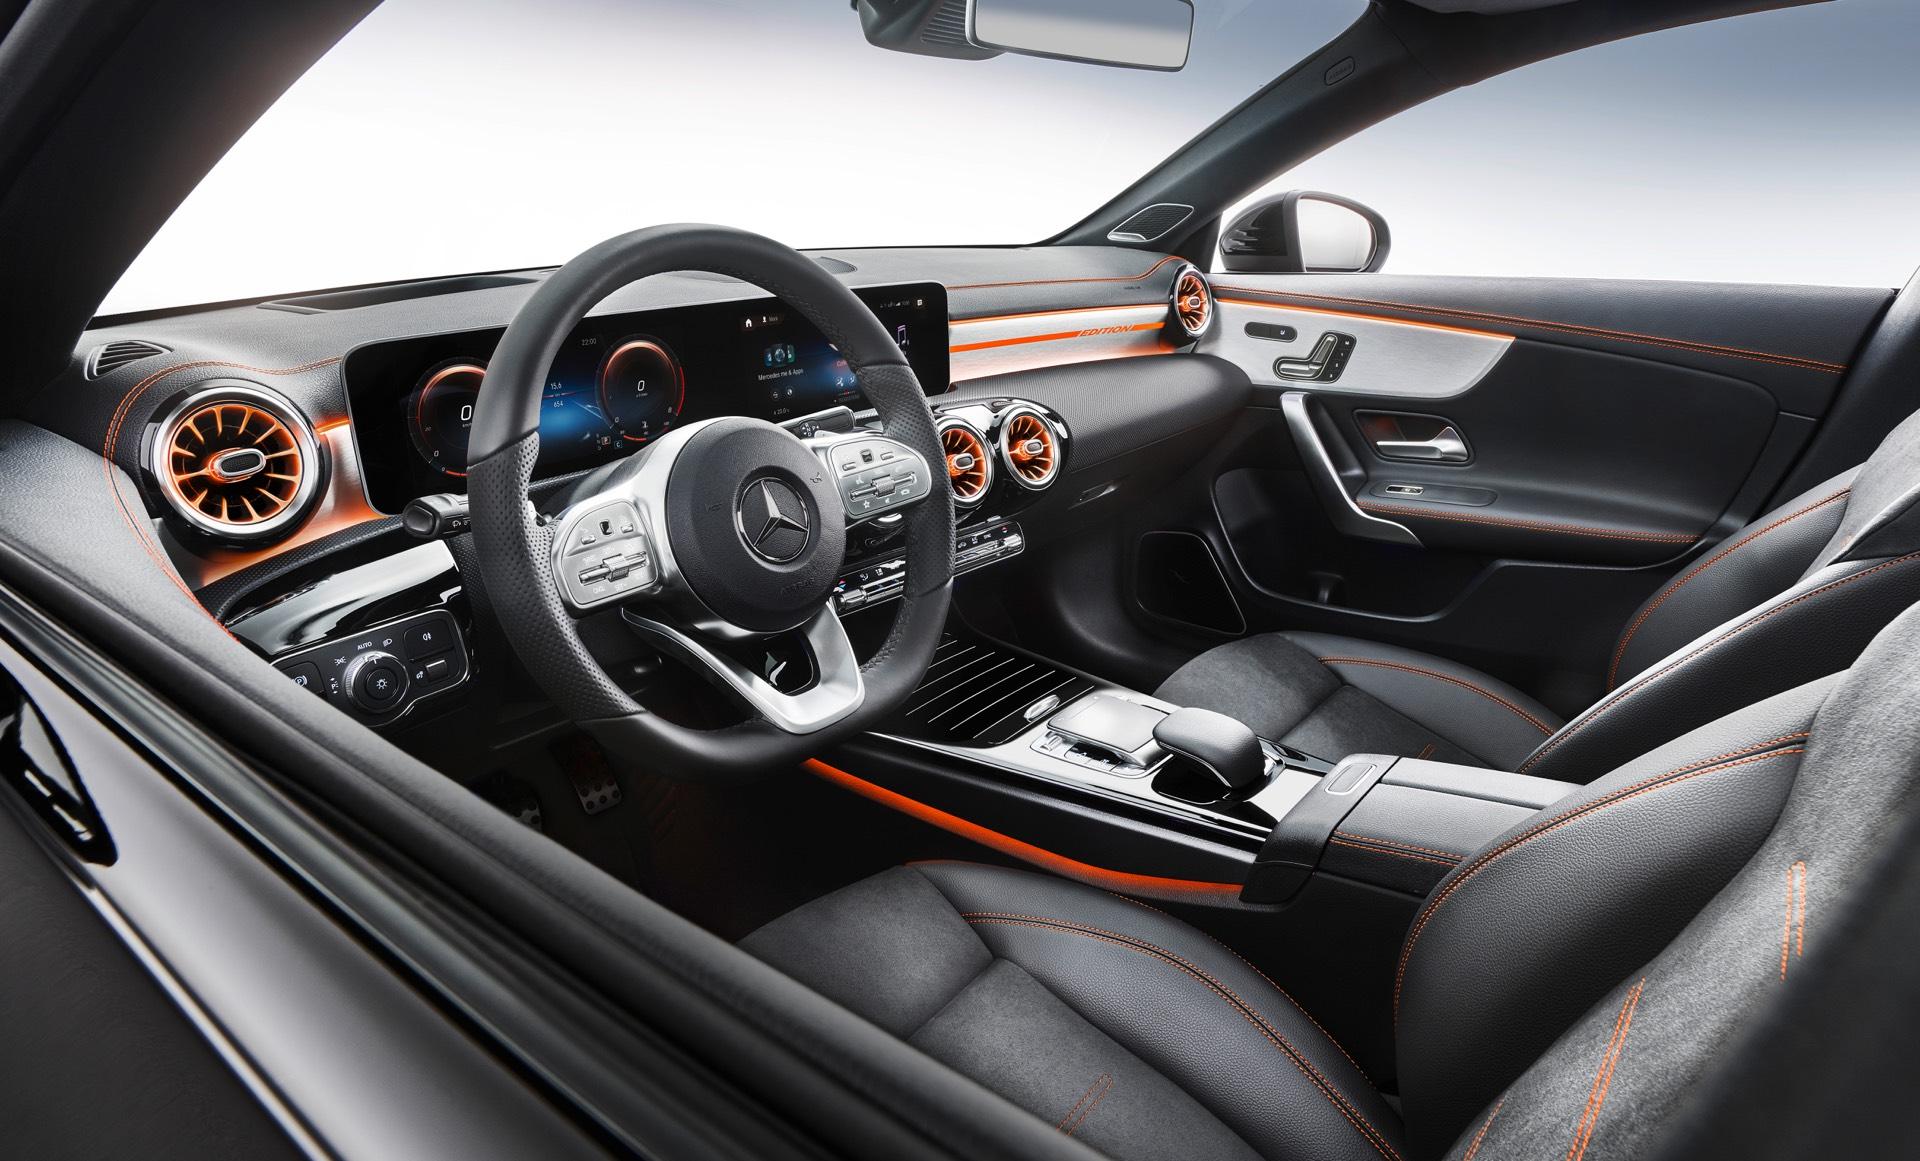 2019 Mercedes-Benz CLA Class Drivers Seat